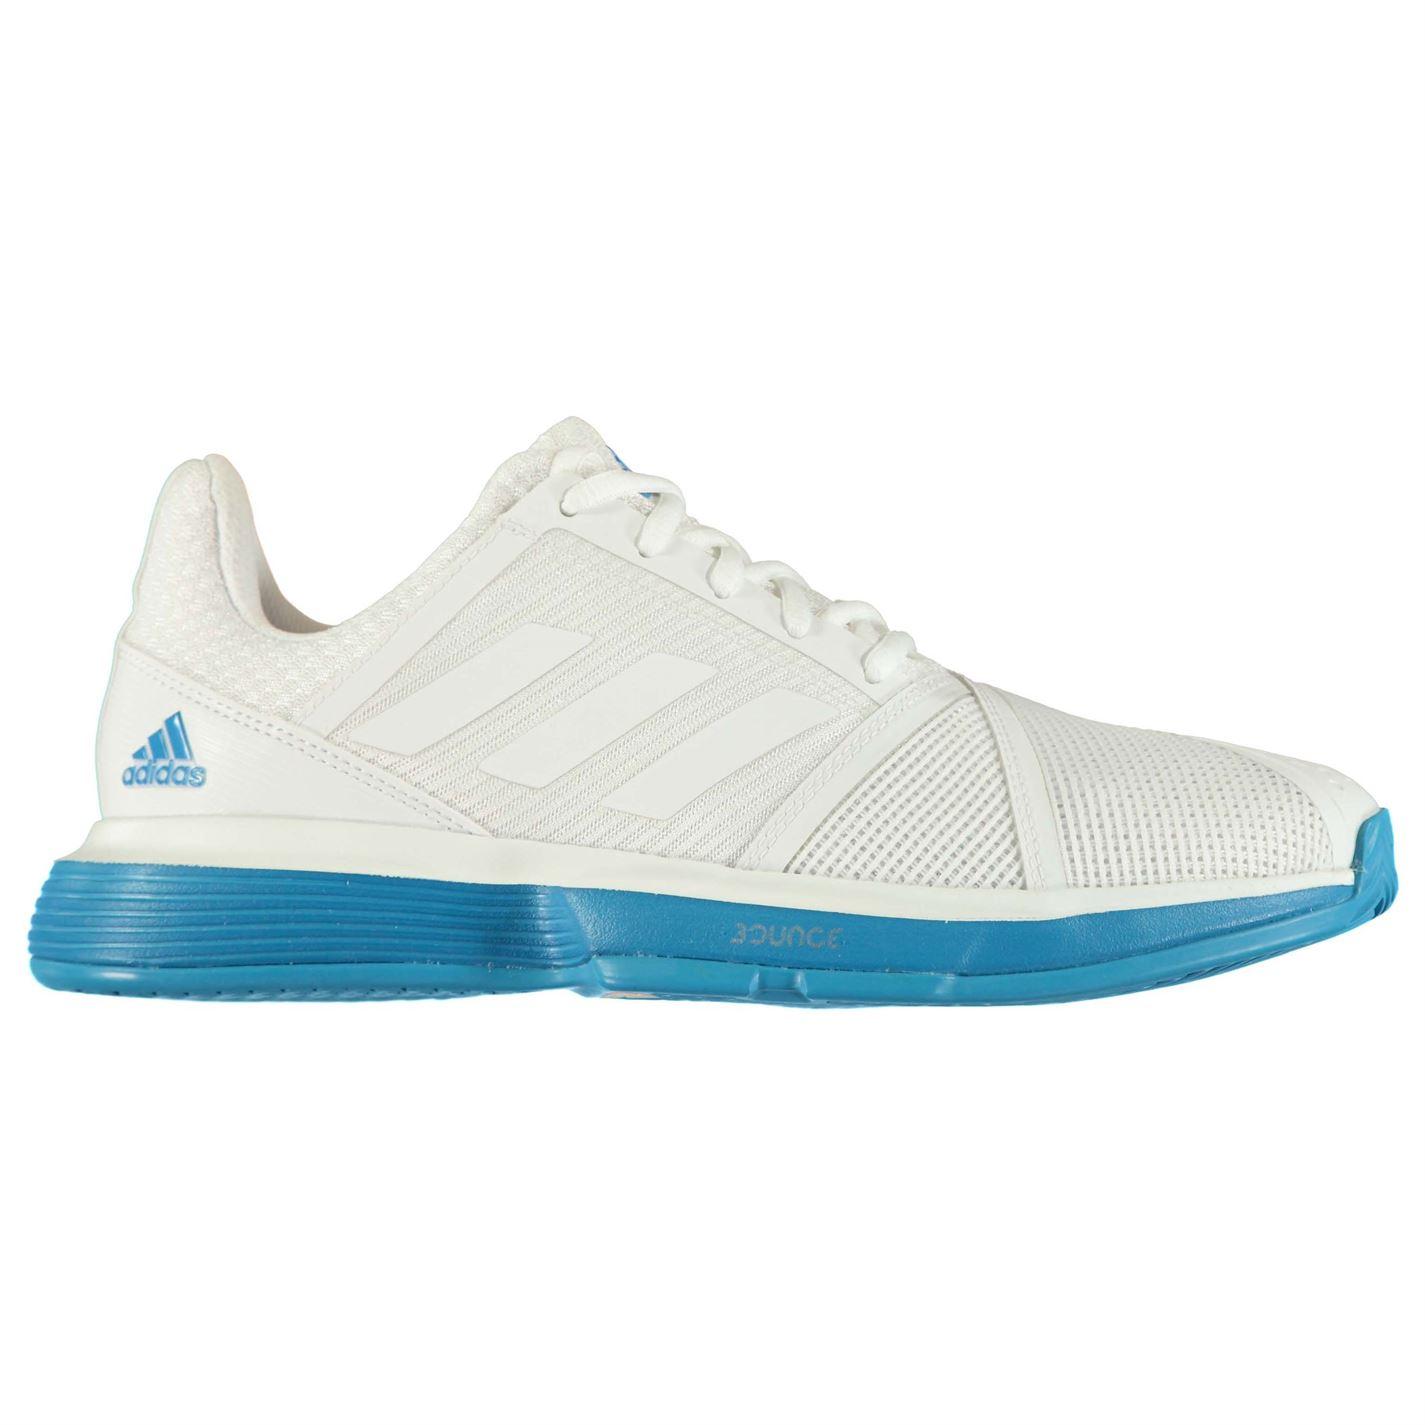 boty adidas Court Jam Bou Sn92